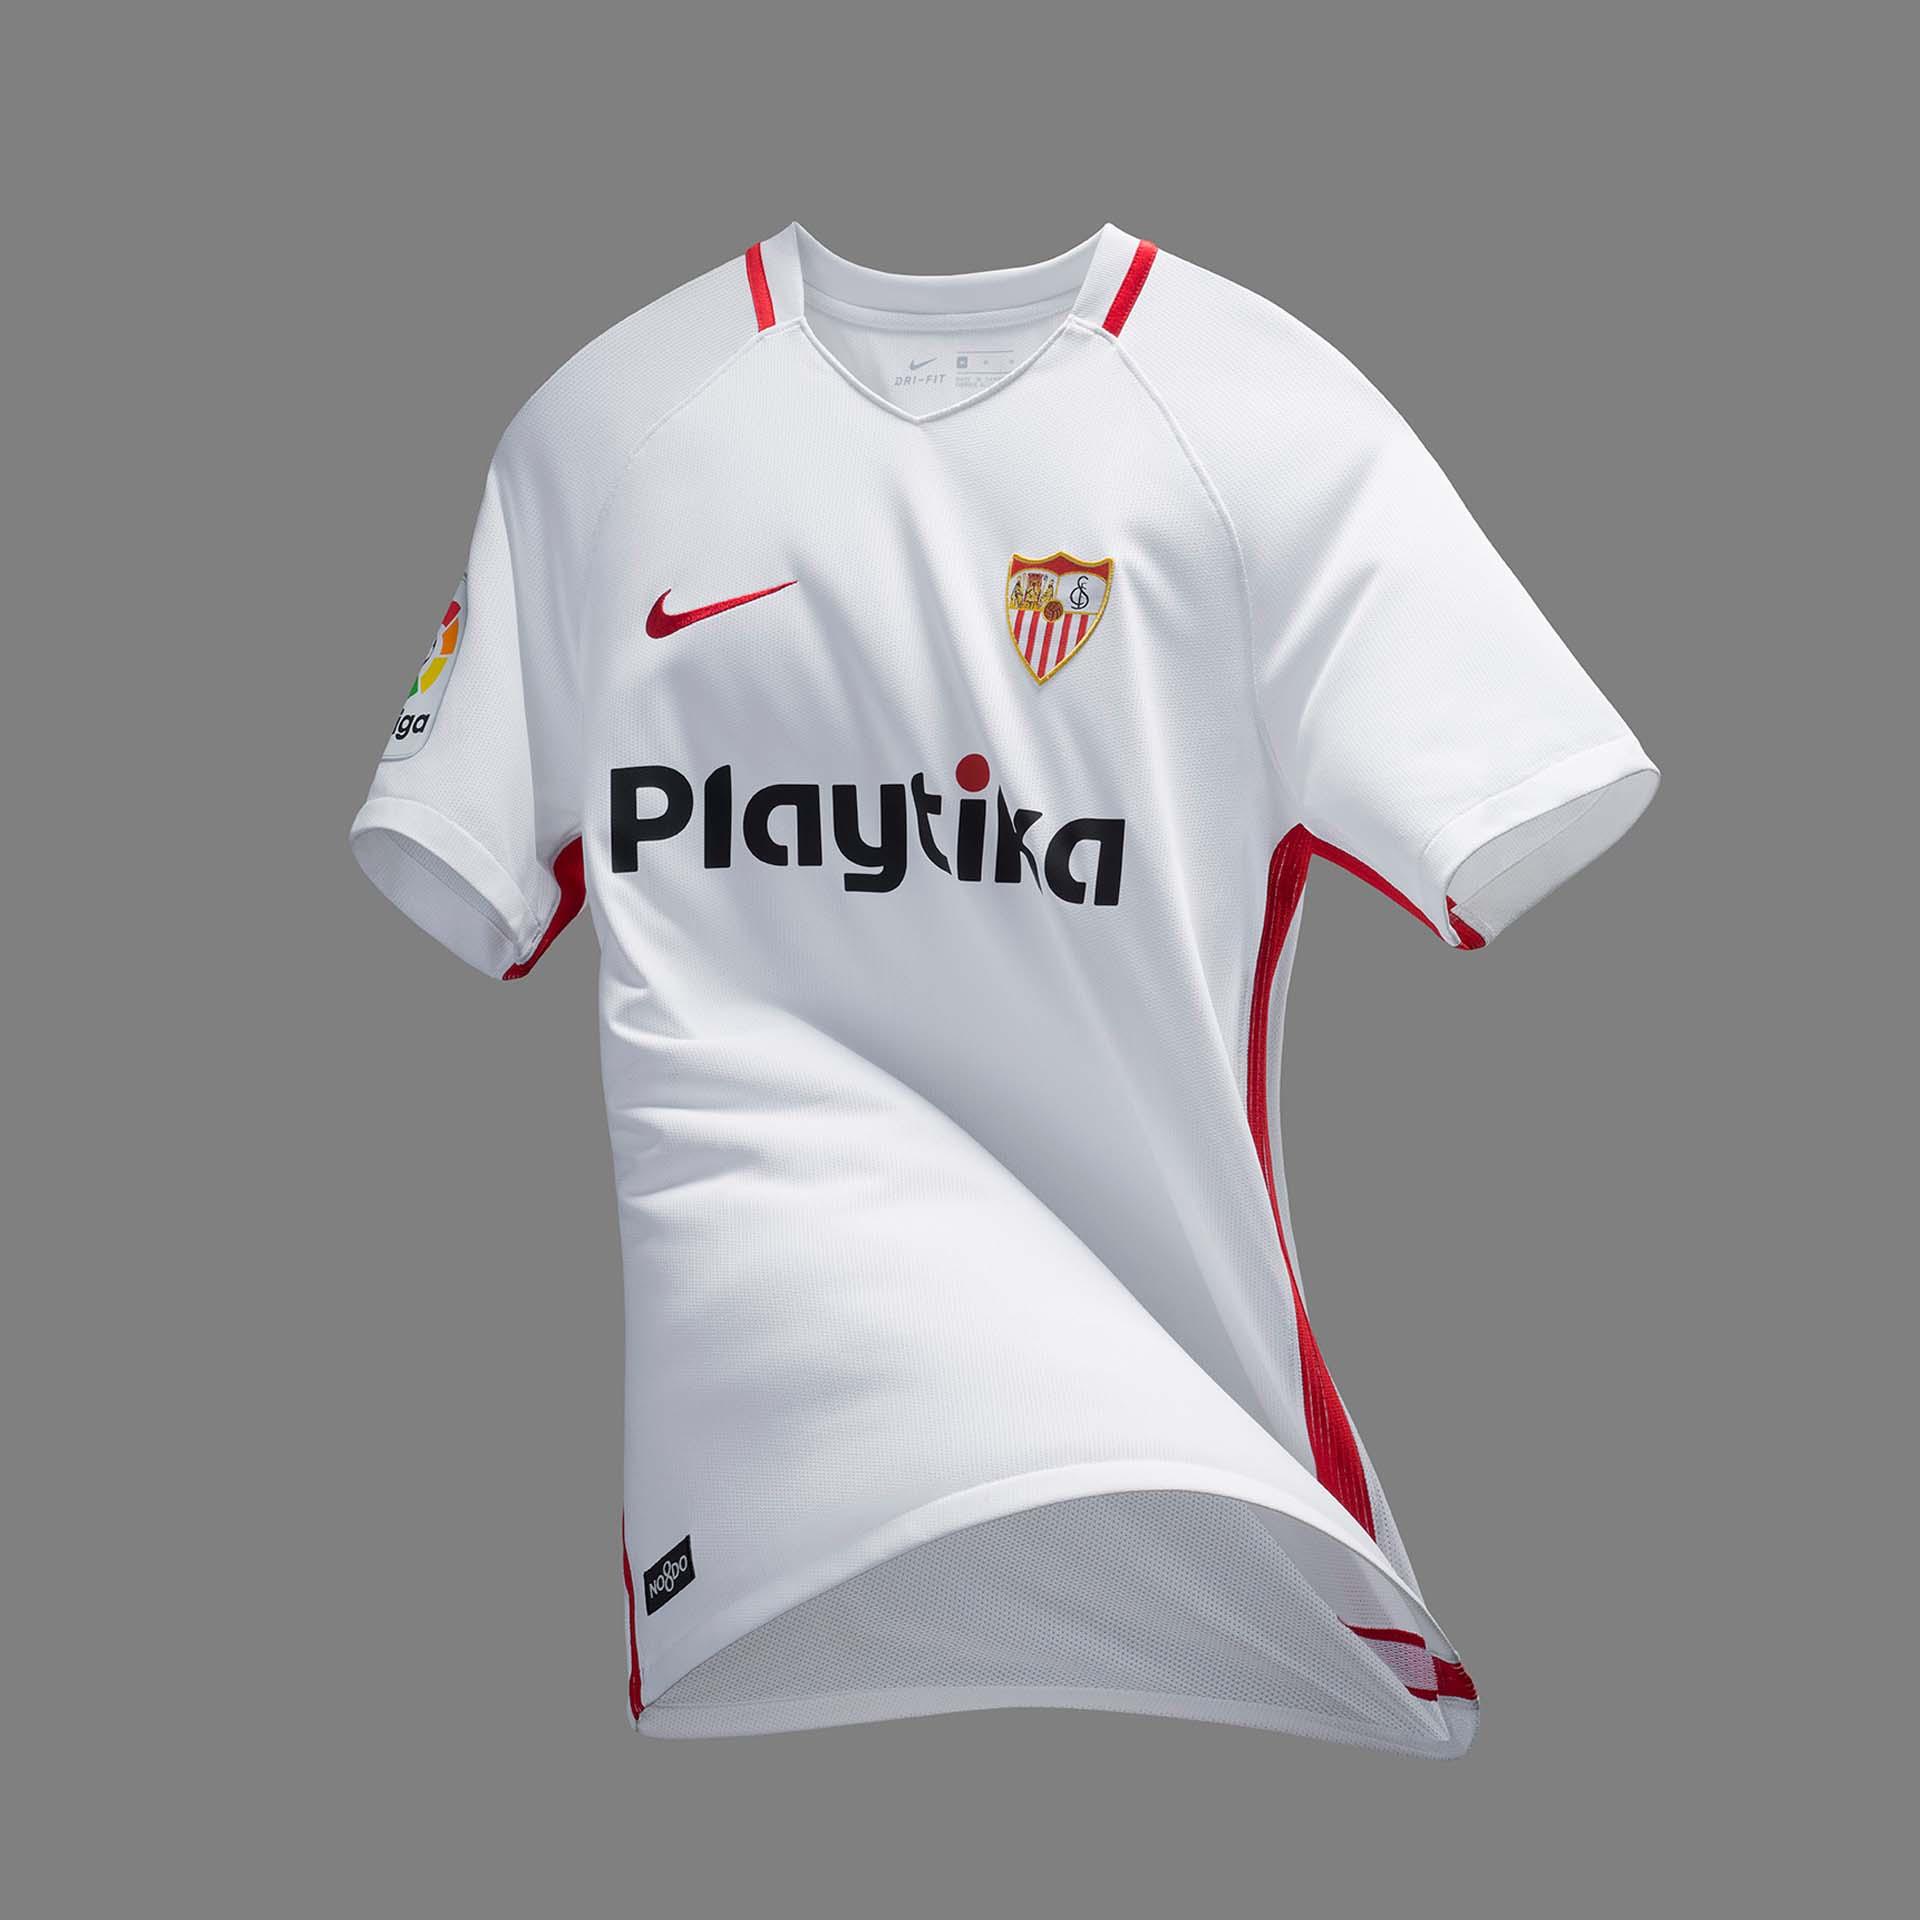 31d2cad06 Nike Launch Sevilla 18 19 Home